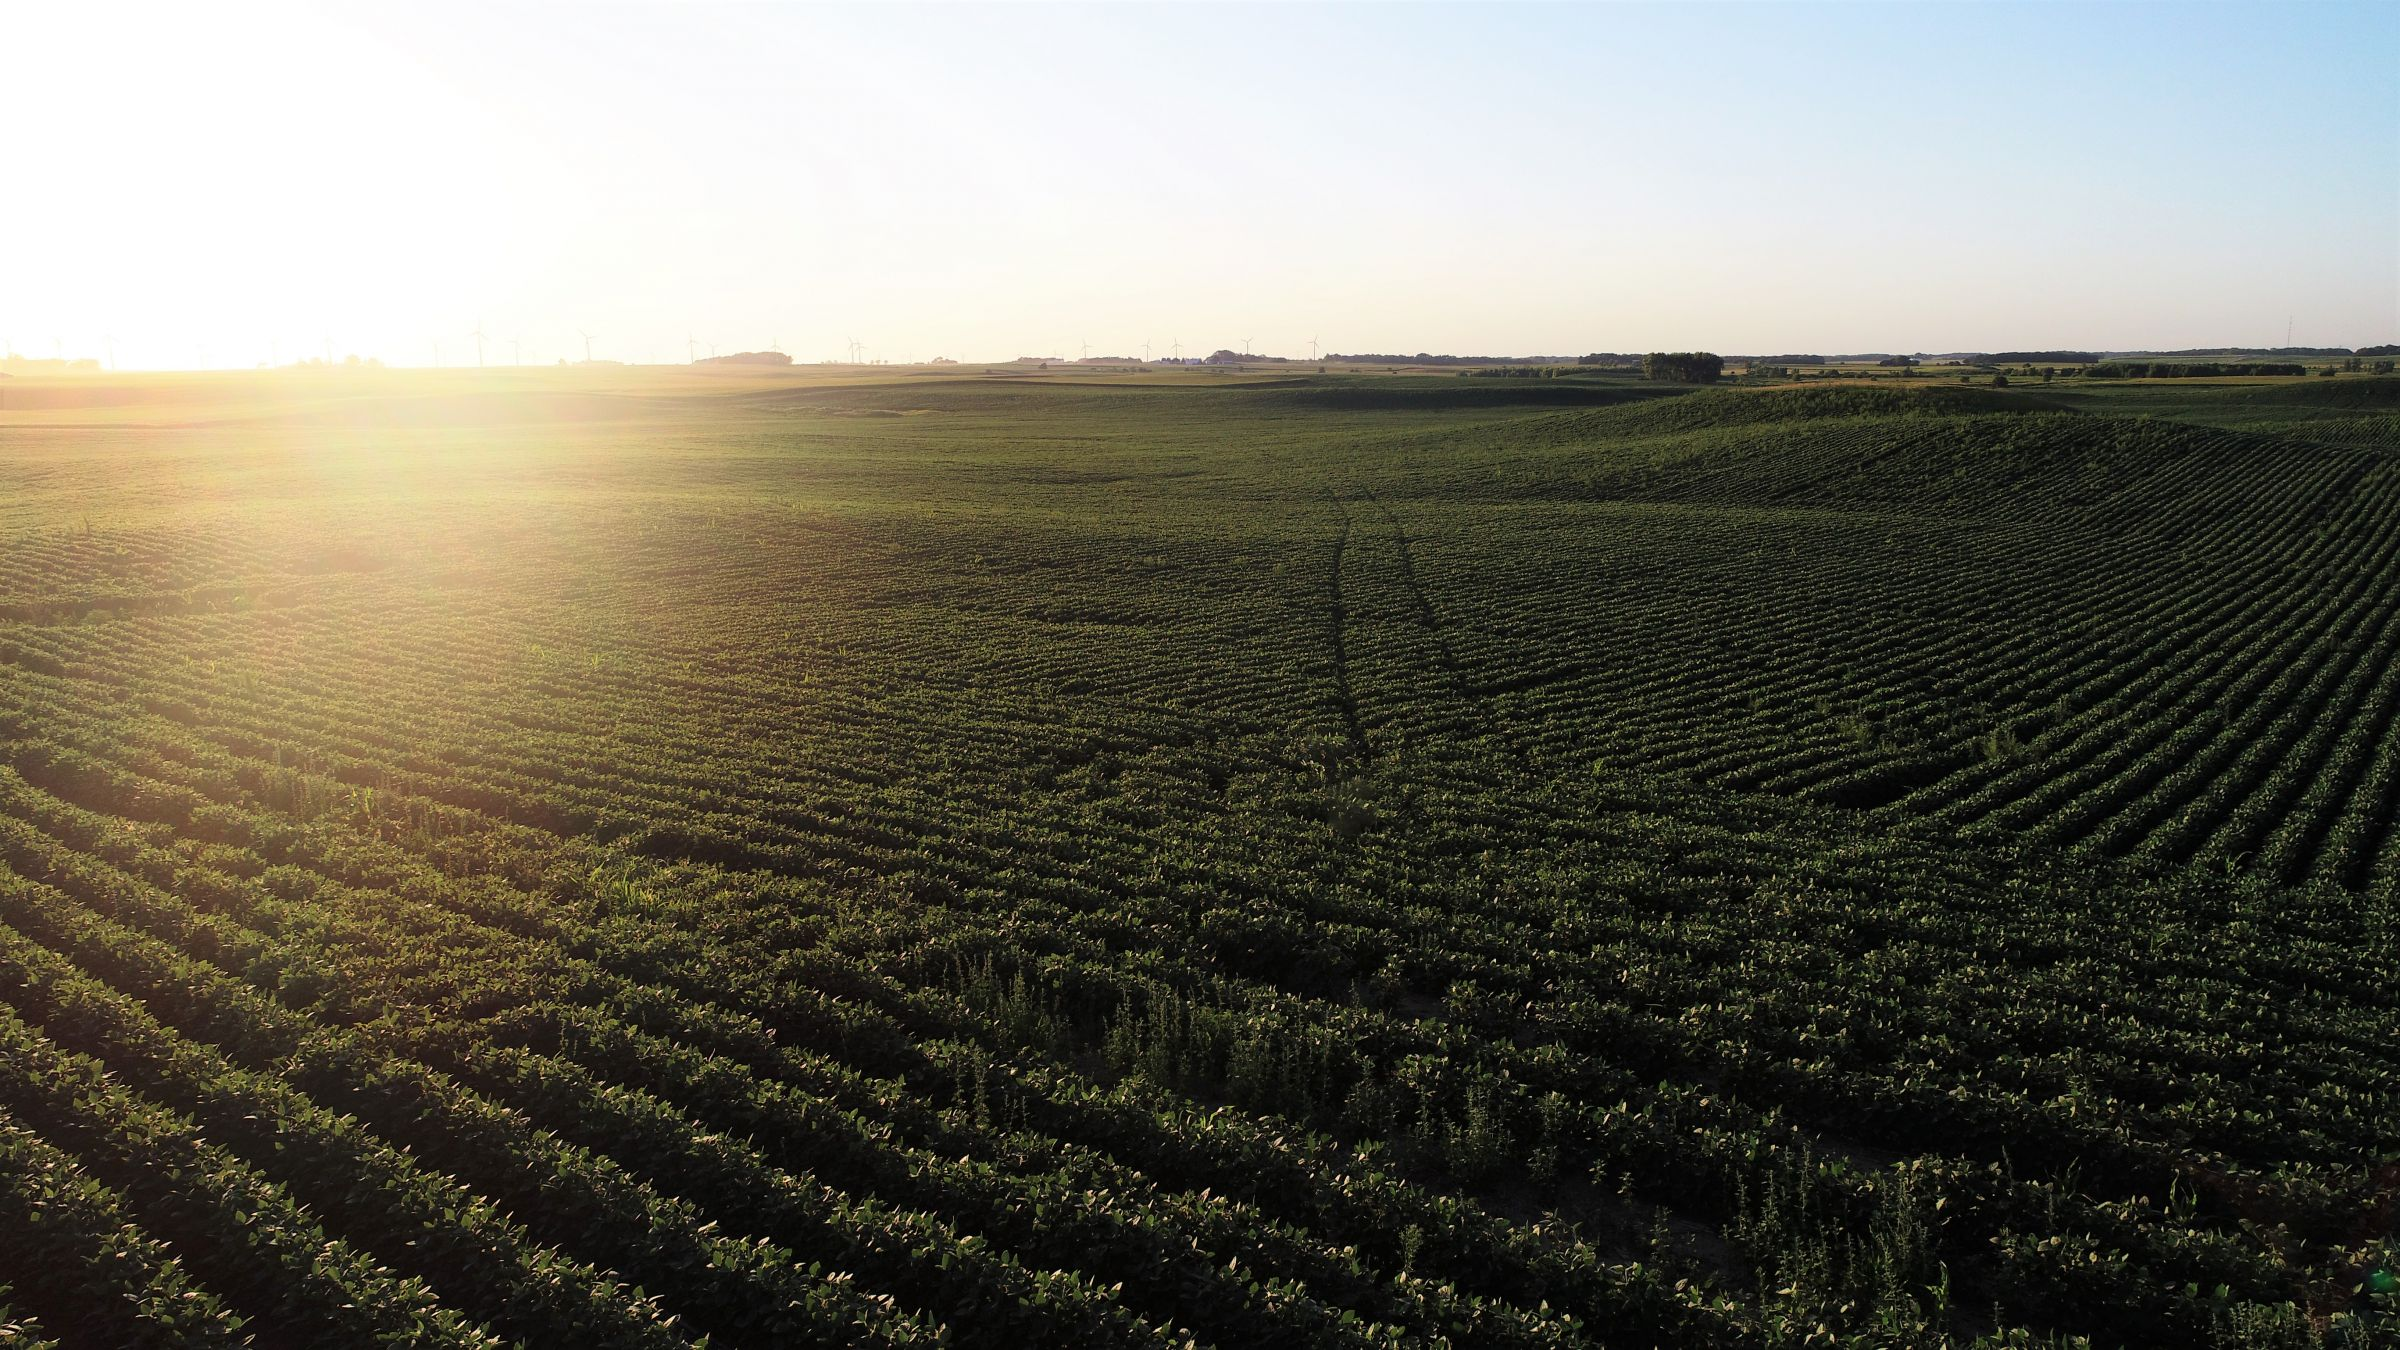 14763-cerro-gordo-farmland-for-sale-200-acres-ml-3-2019-11-07-180511.jpg